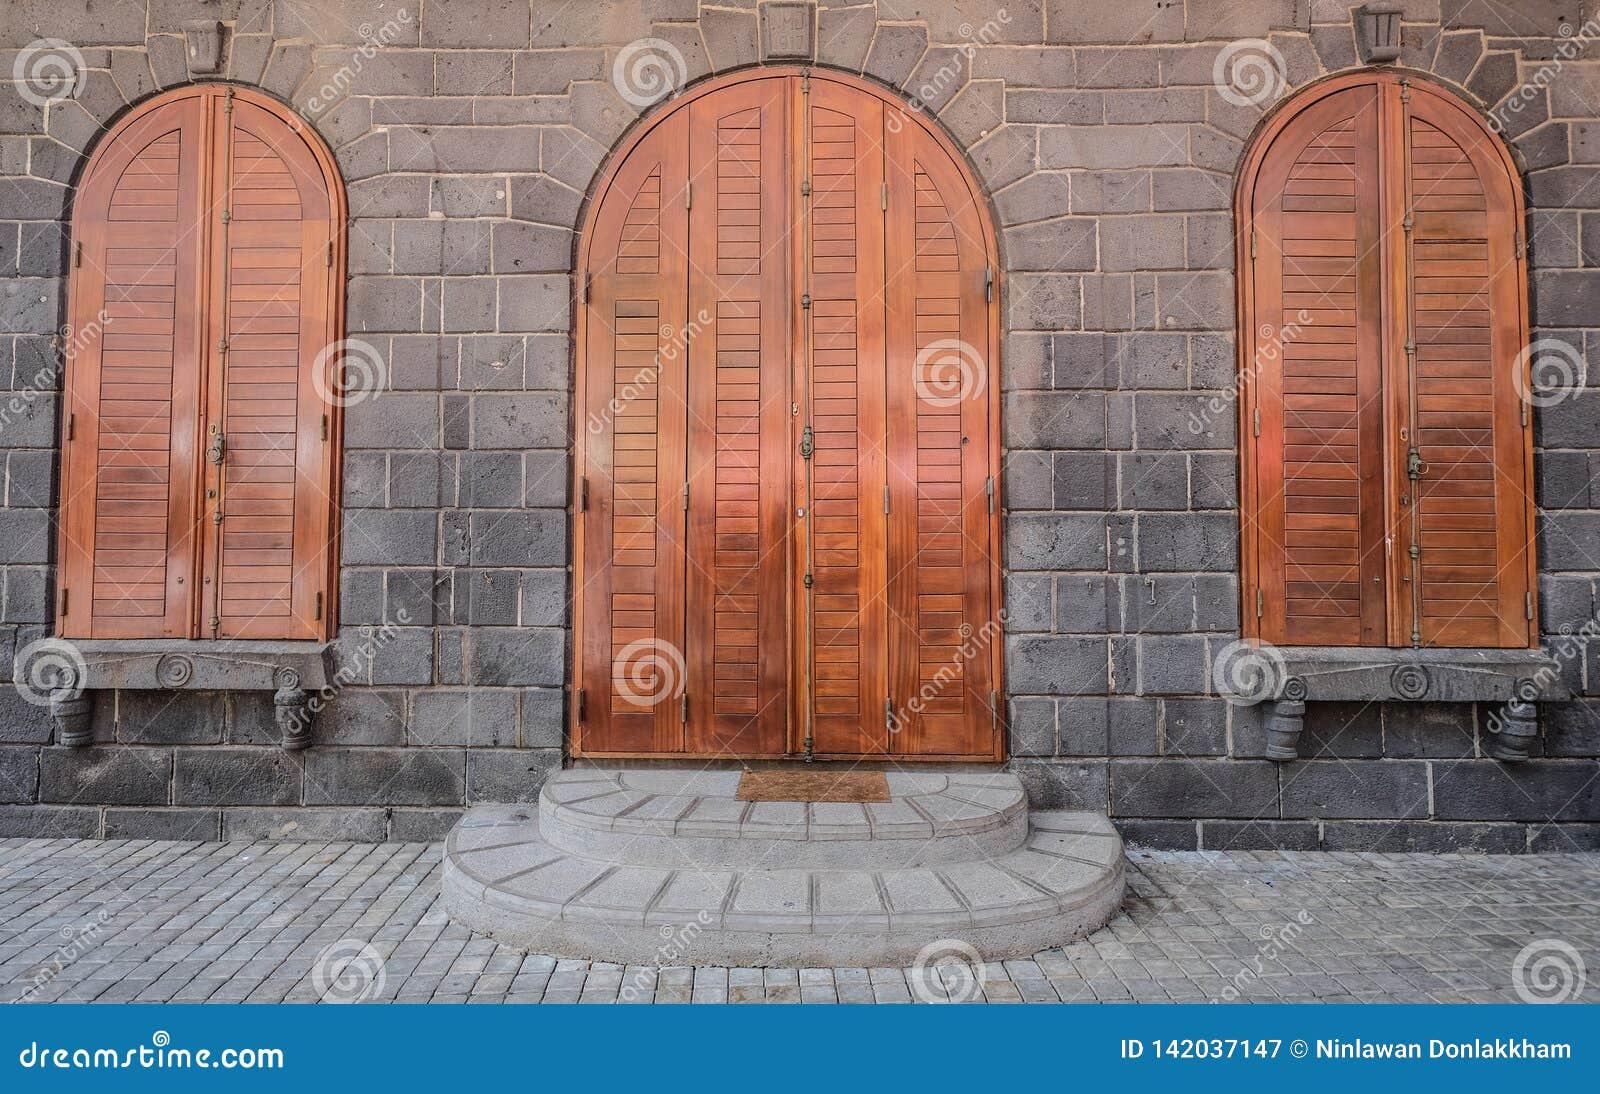 Wooden doors of ancient fortress